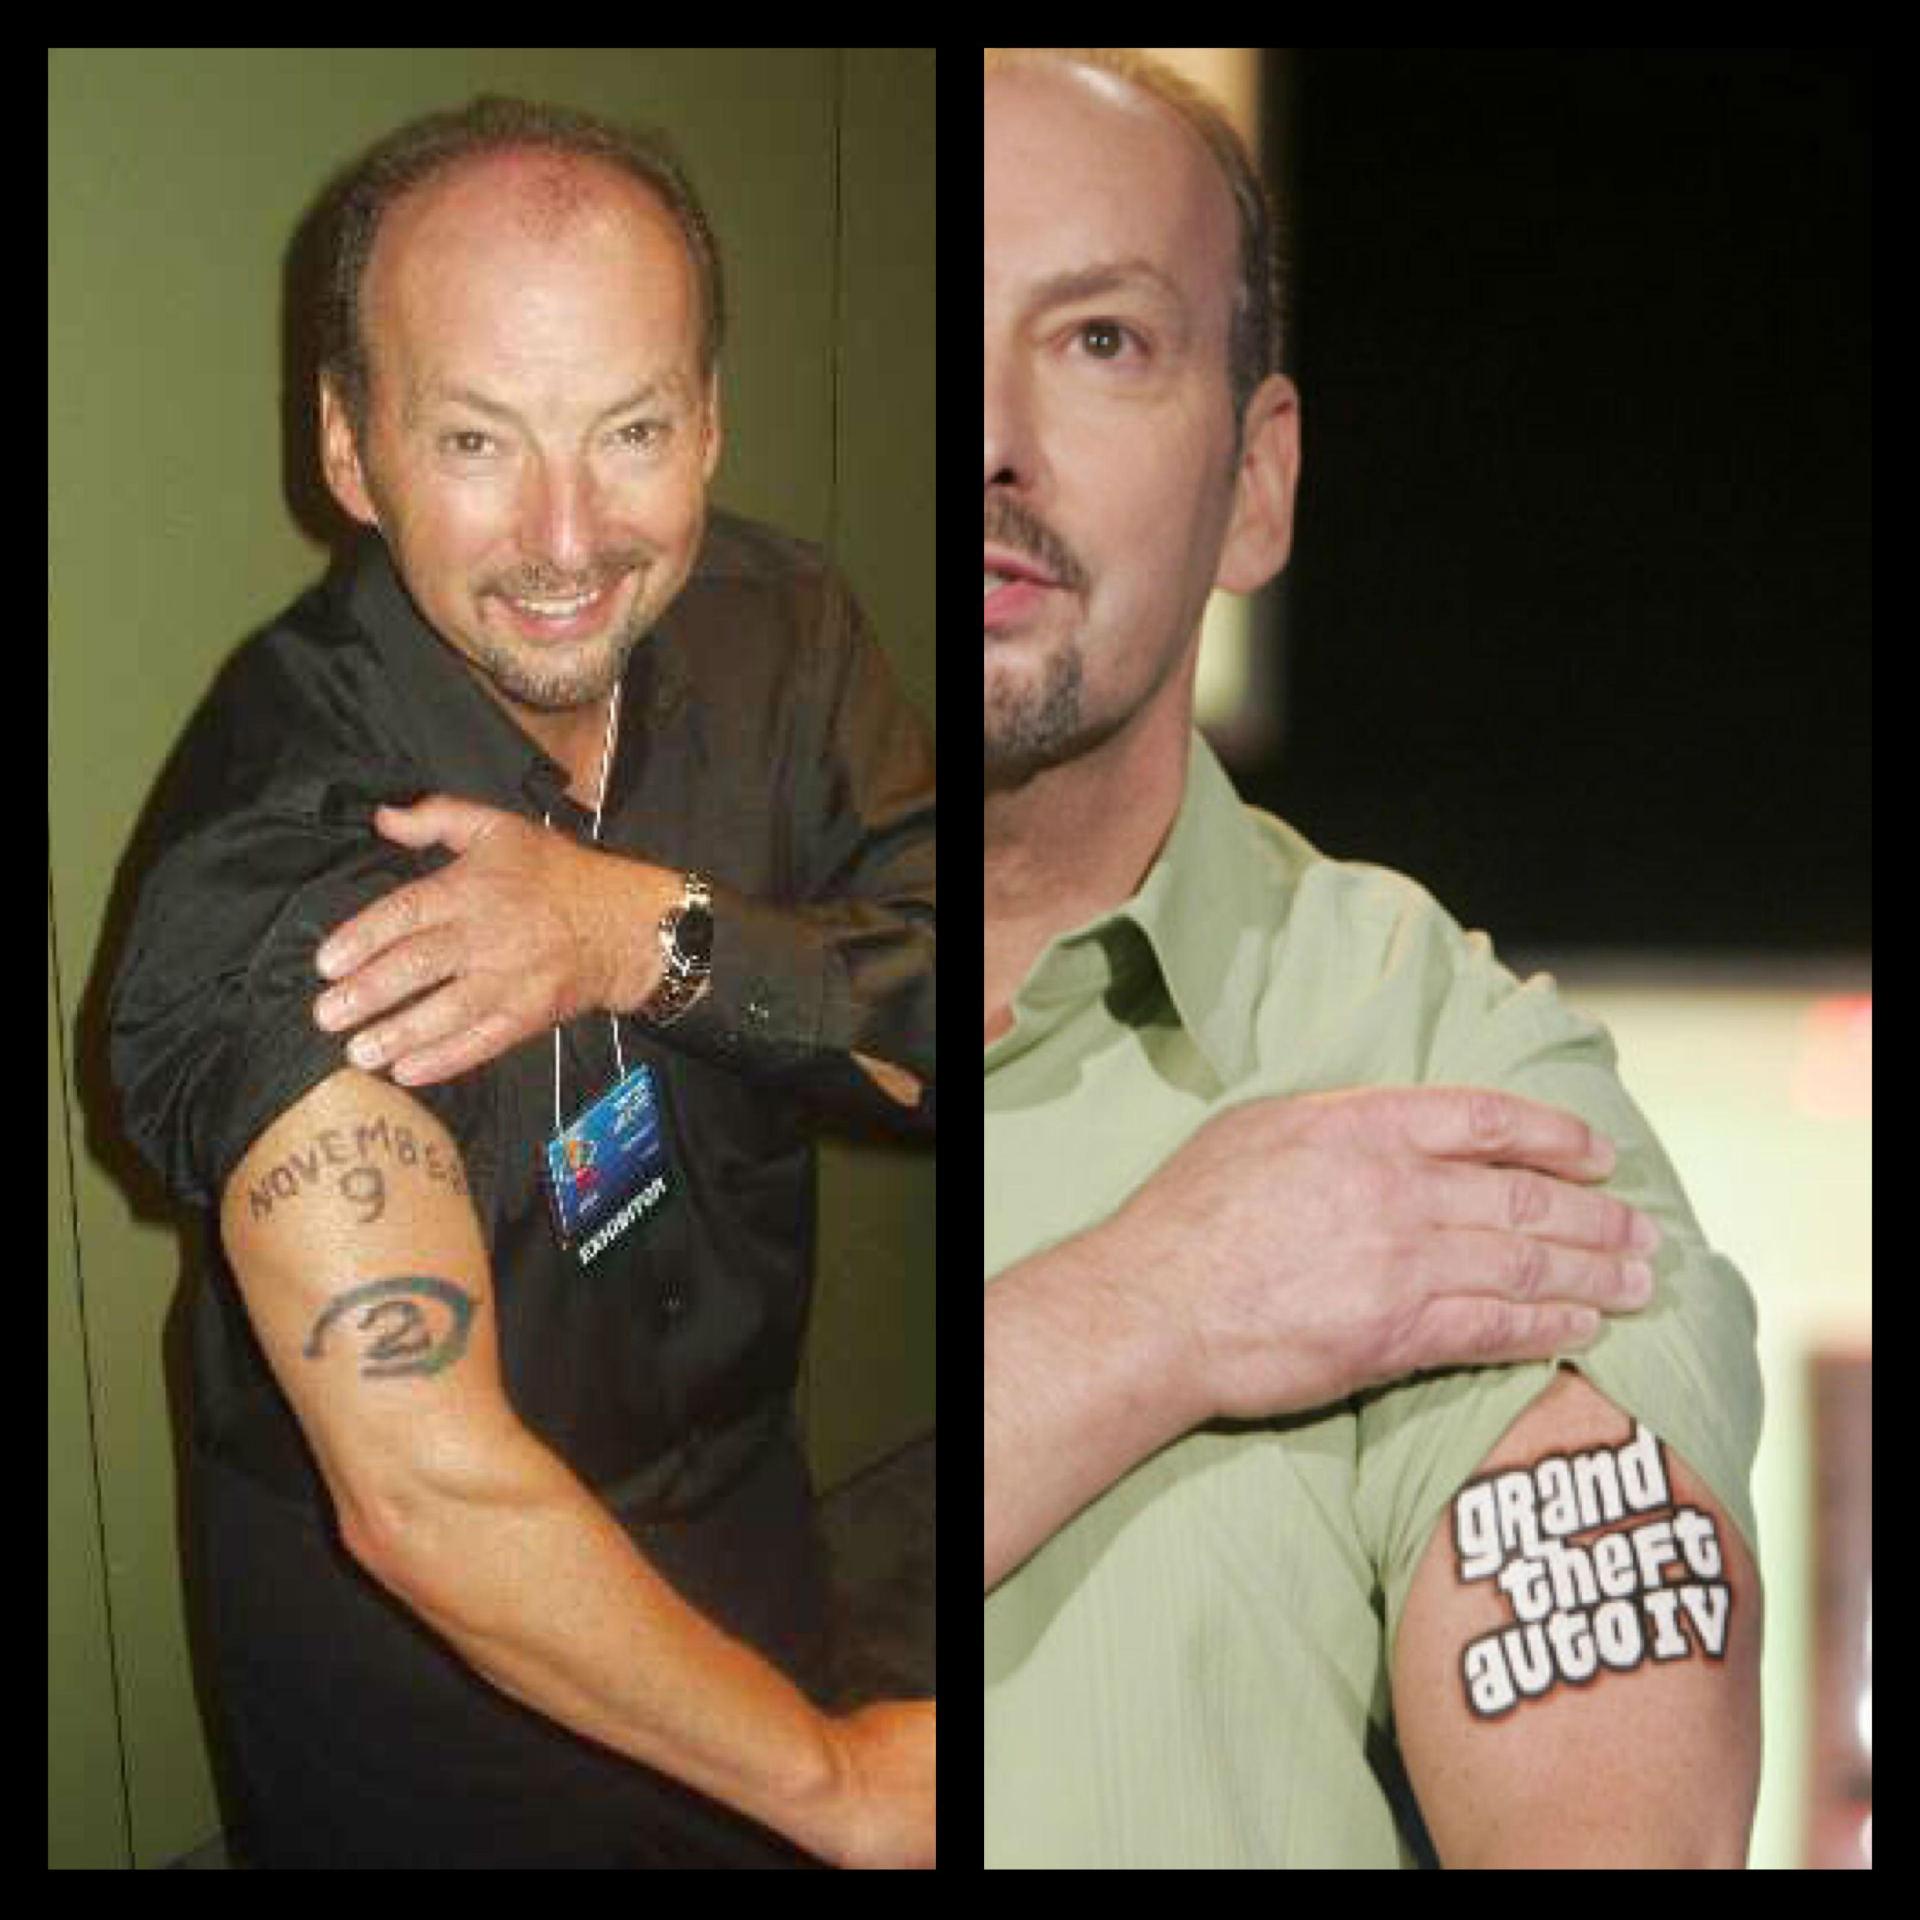 Peter Moore E3 tatuaje